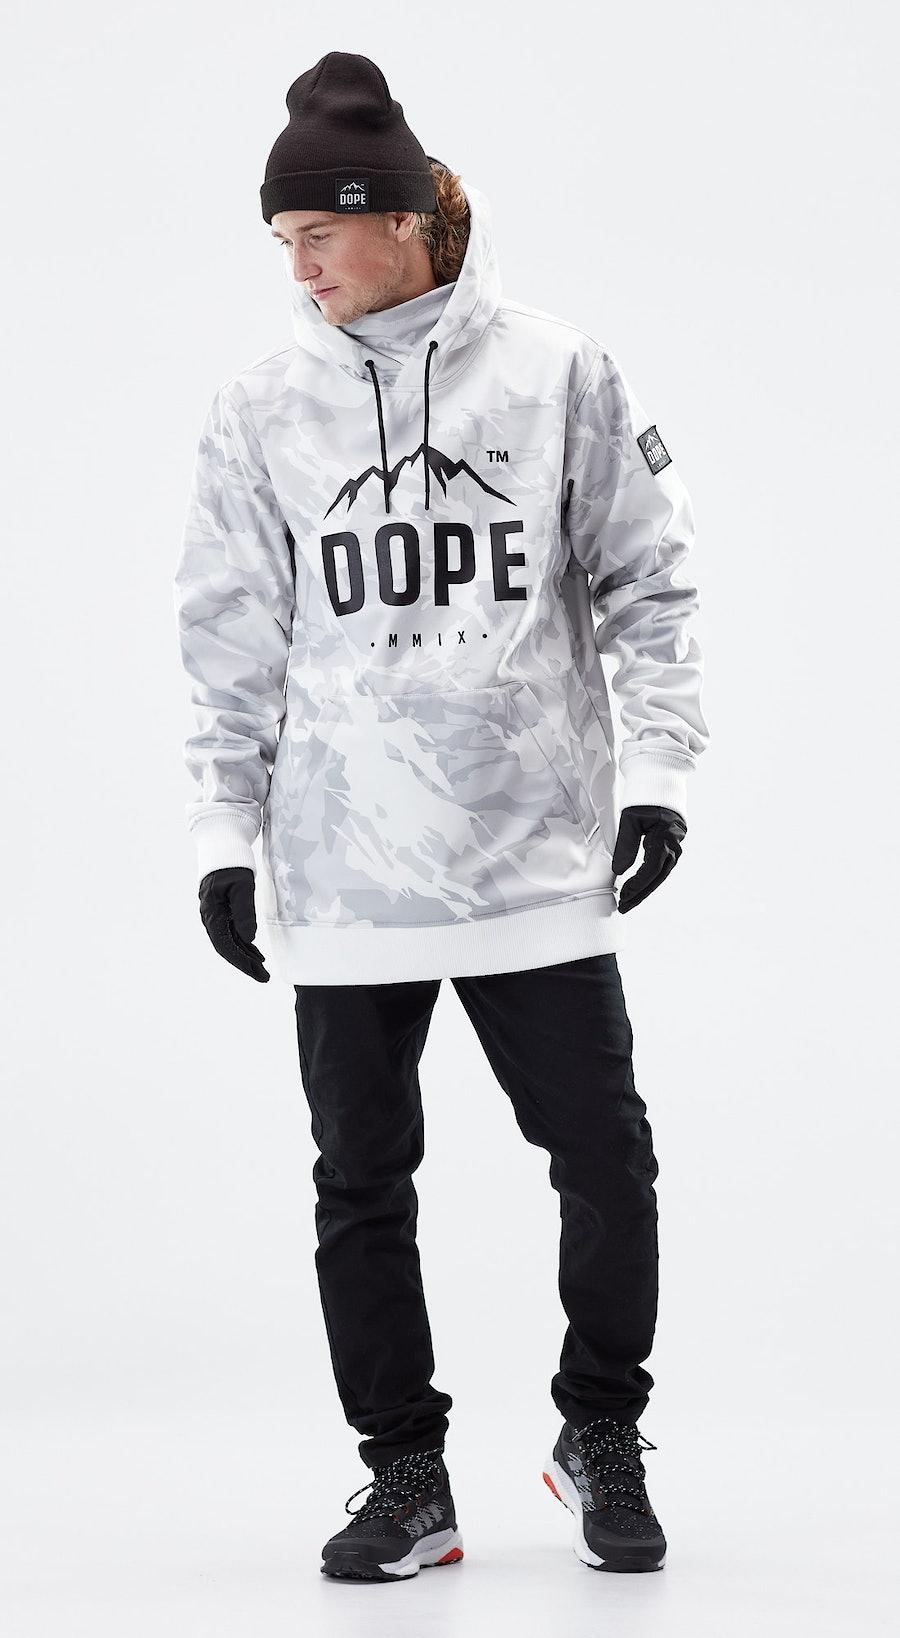 Dope Yeti Paradise Tucks Camo Outfit Multi